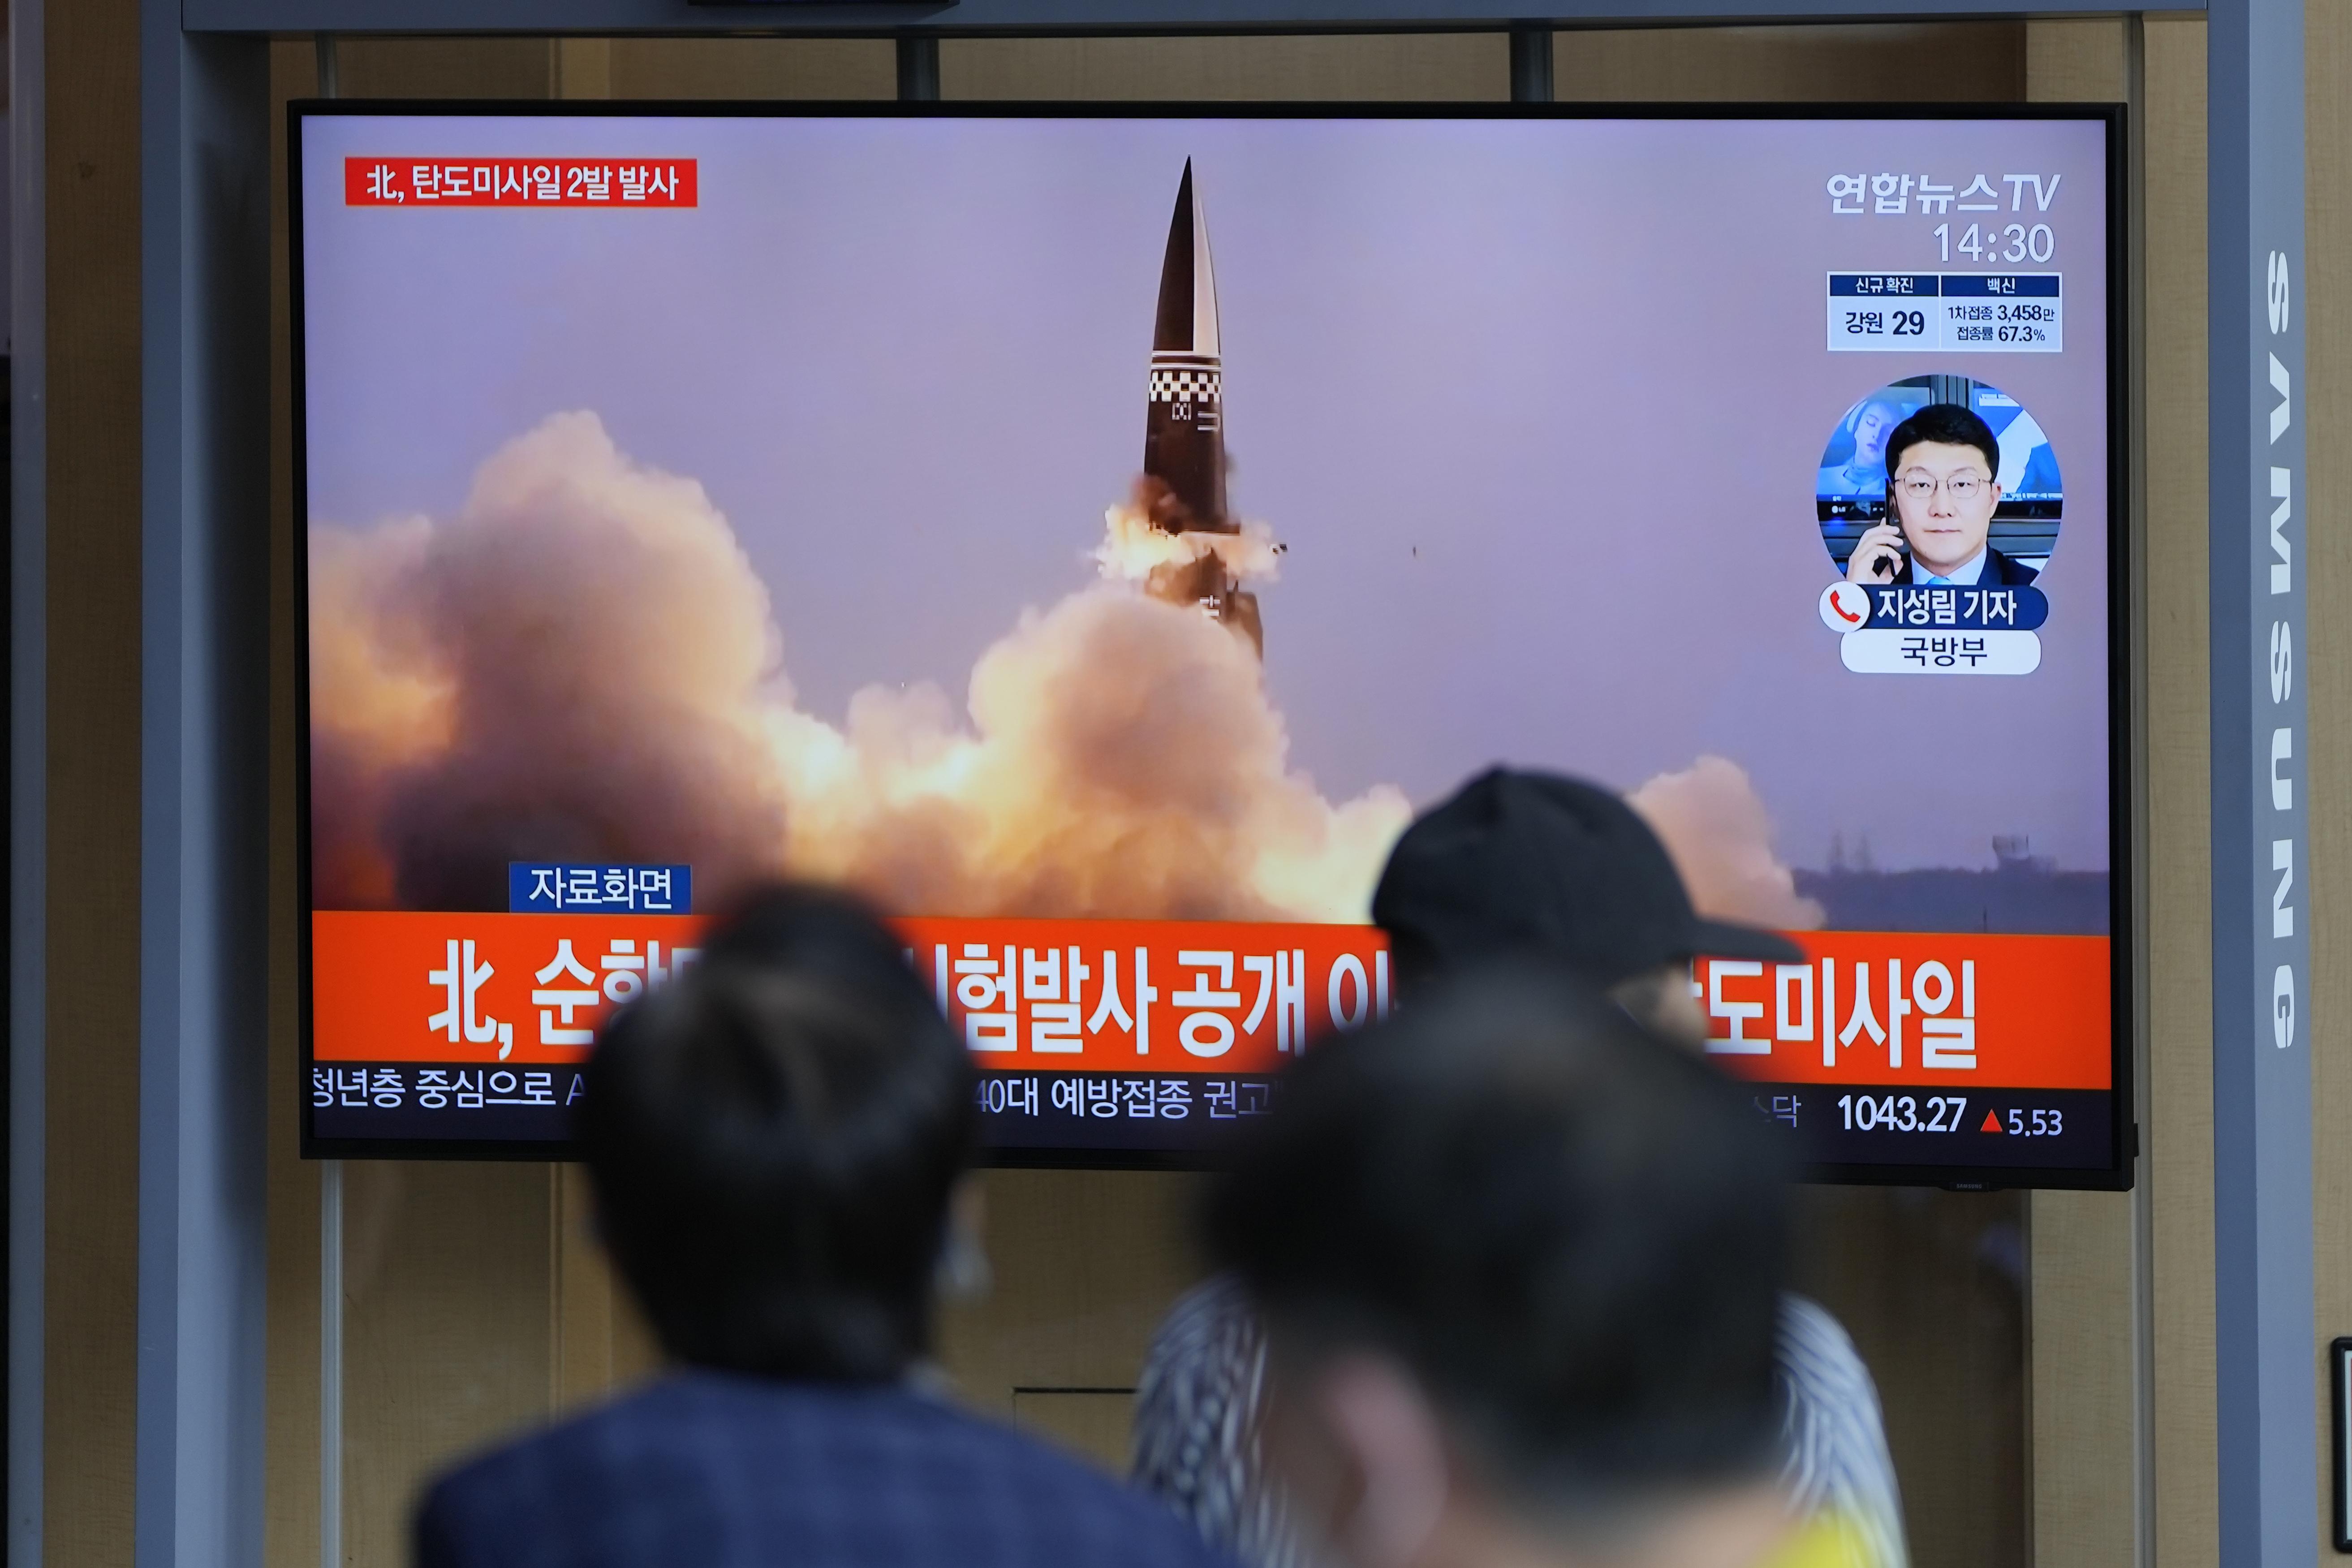 North Korea fires ballistic missiles amid stalled nuclear talks